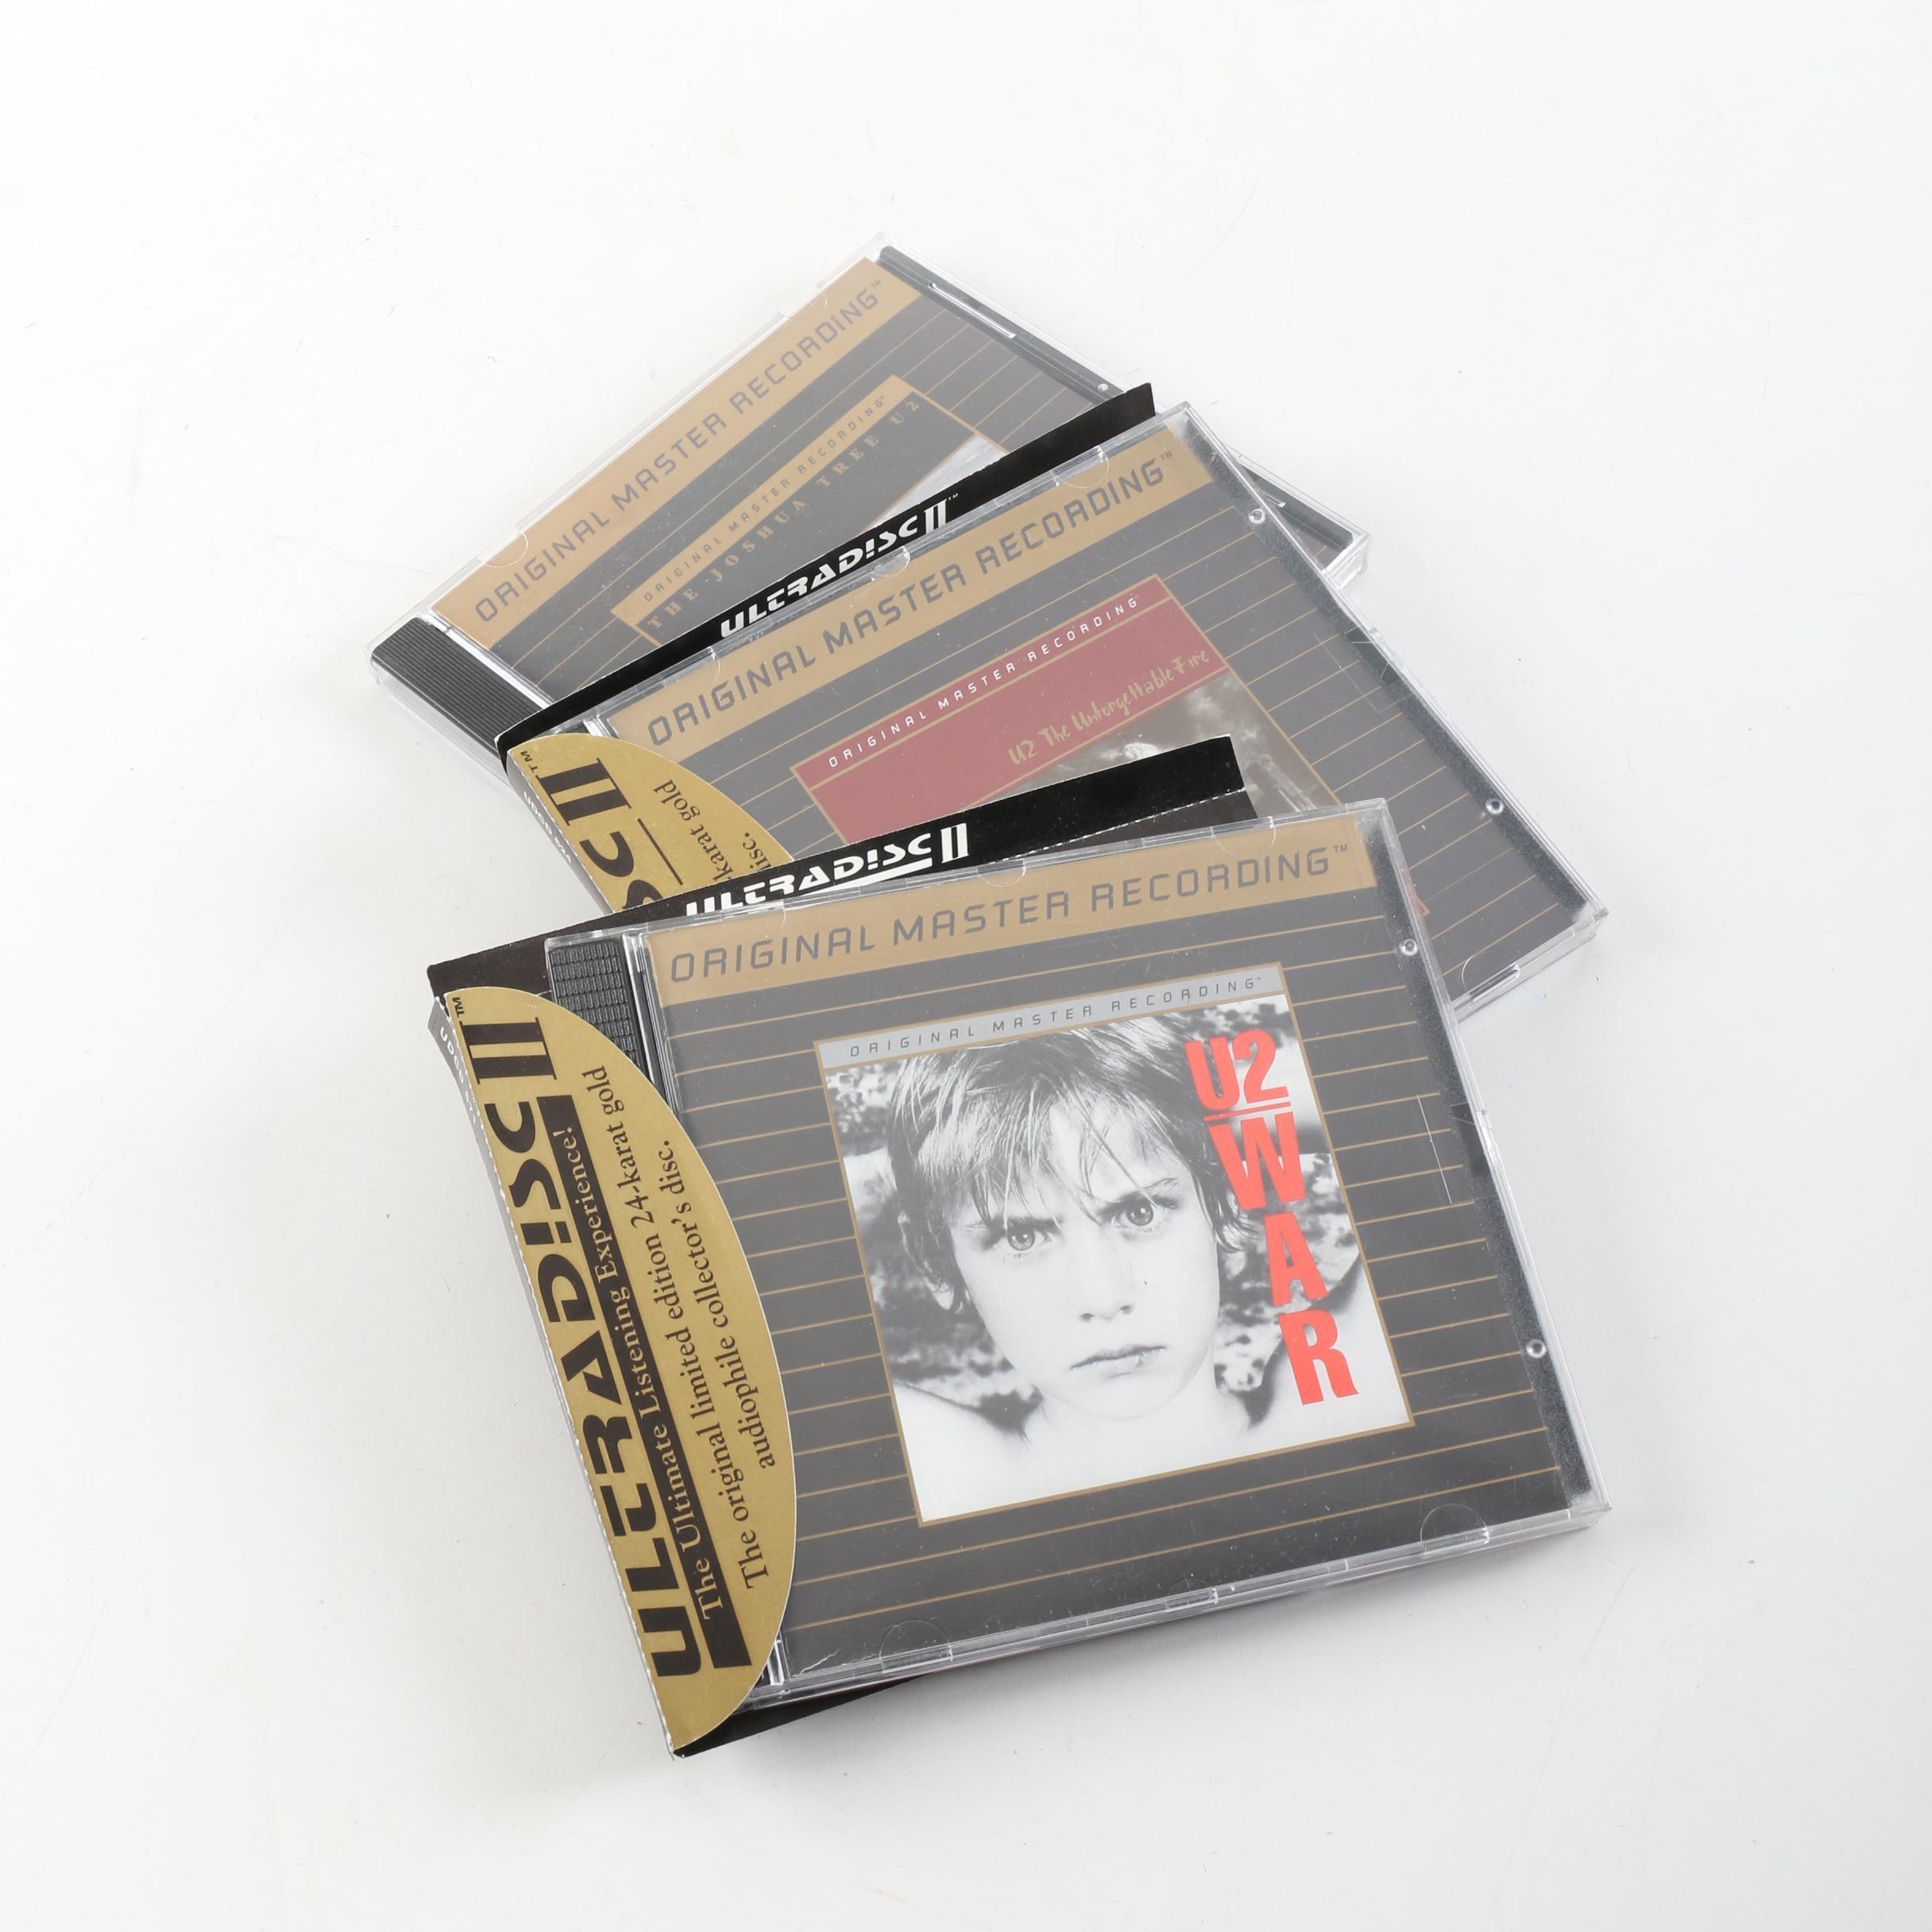 U2 Original Master Recording 24K Gold Plated Audiophile Discs